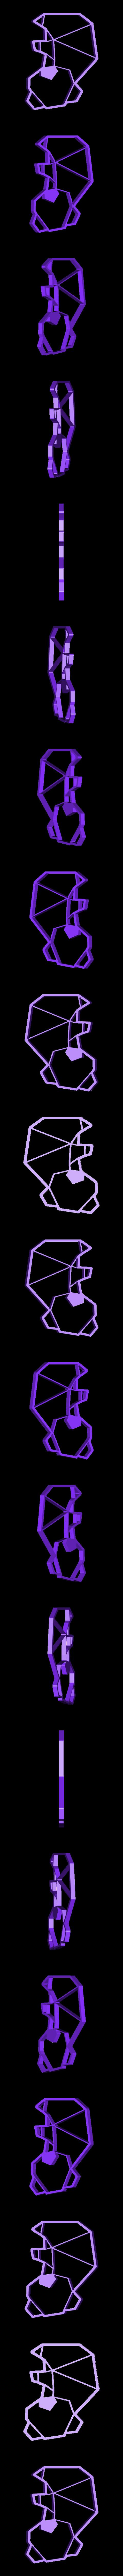 customized_origami_koala.stl Download free STL file Customizable Origami Cute Koala • 3D printable model, MightyNozzle